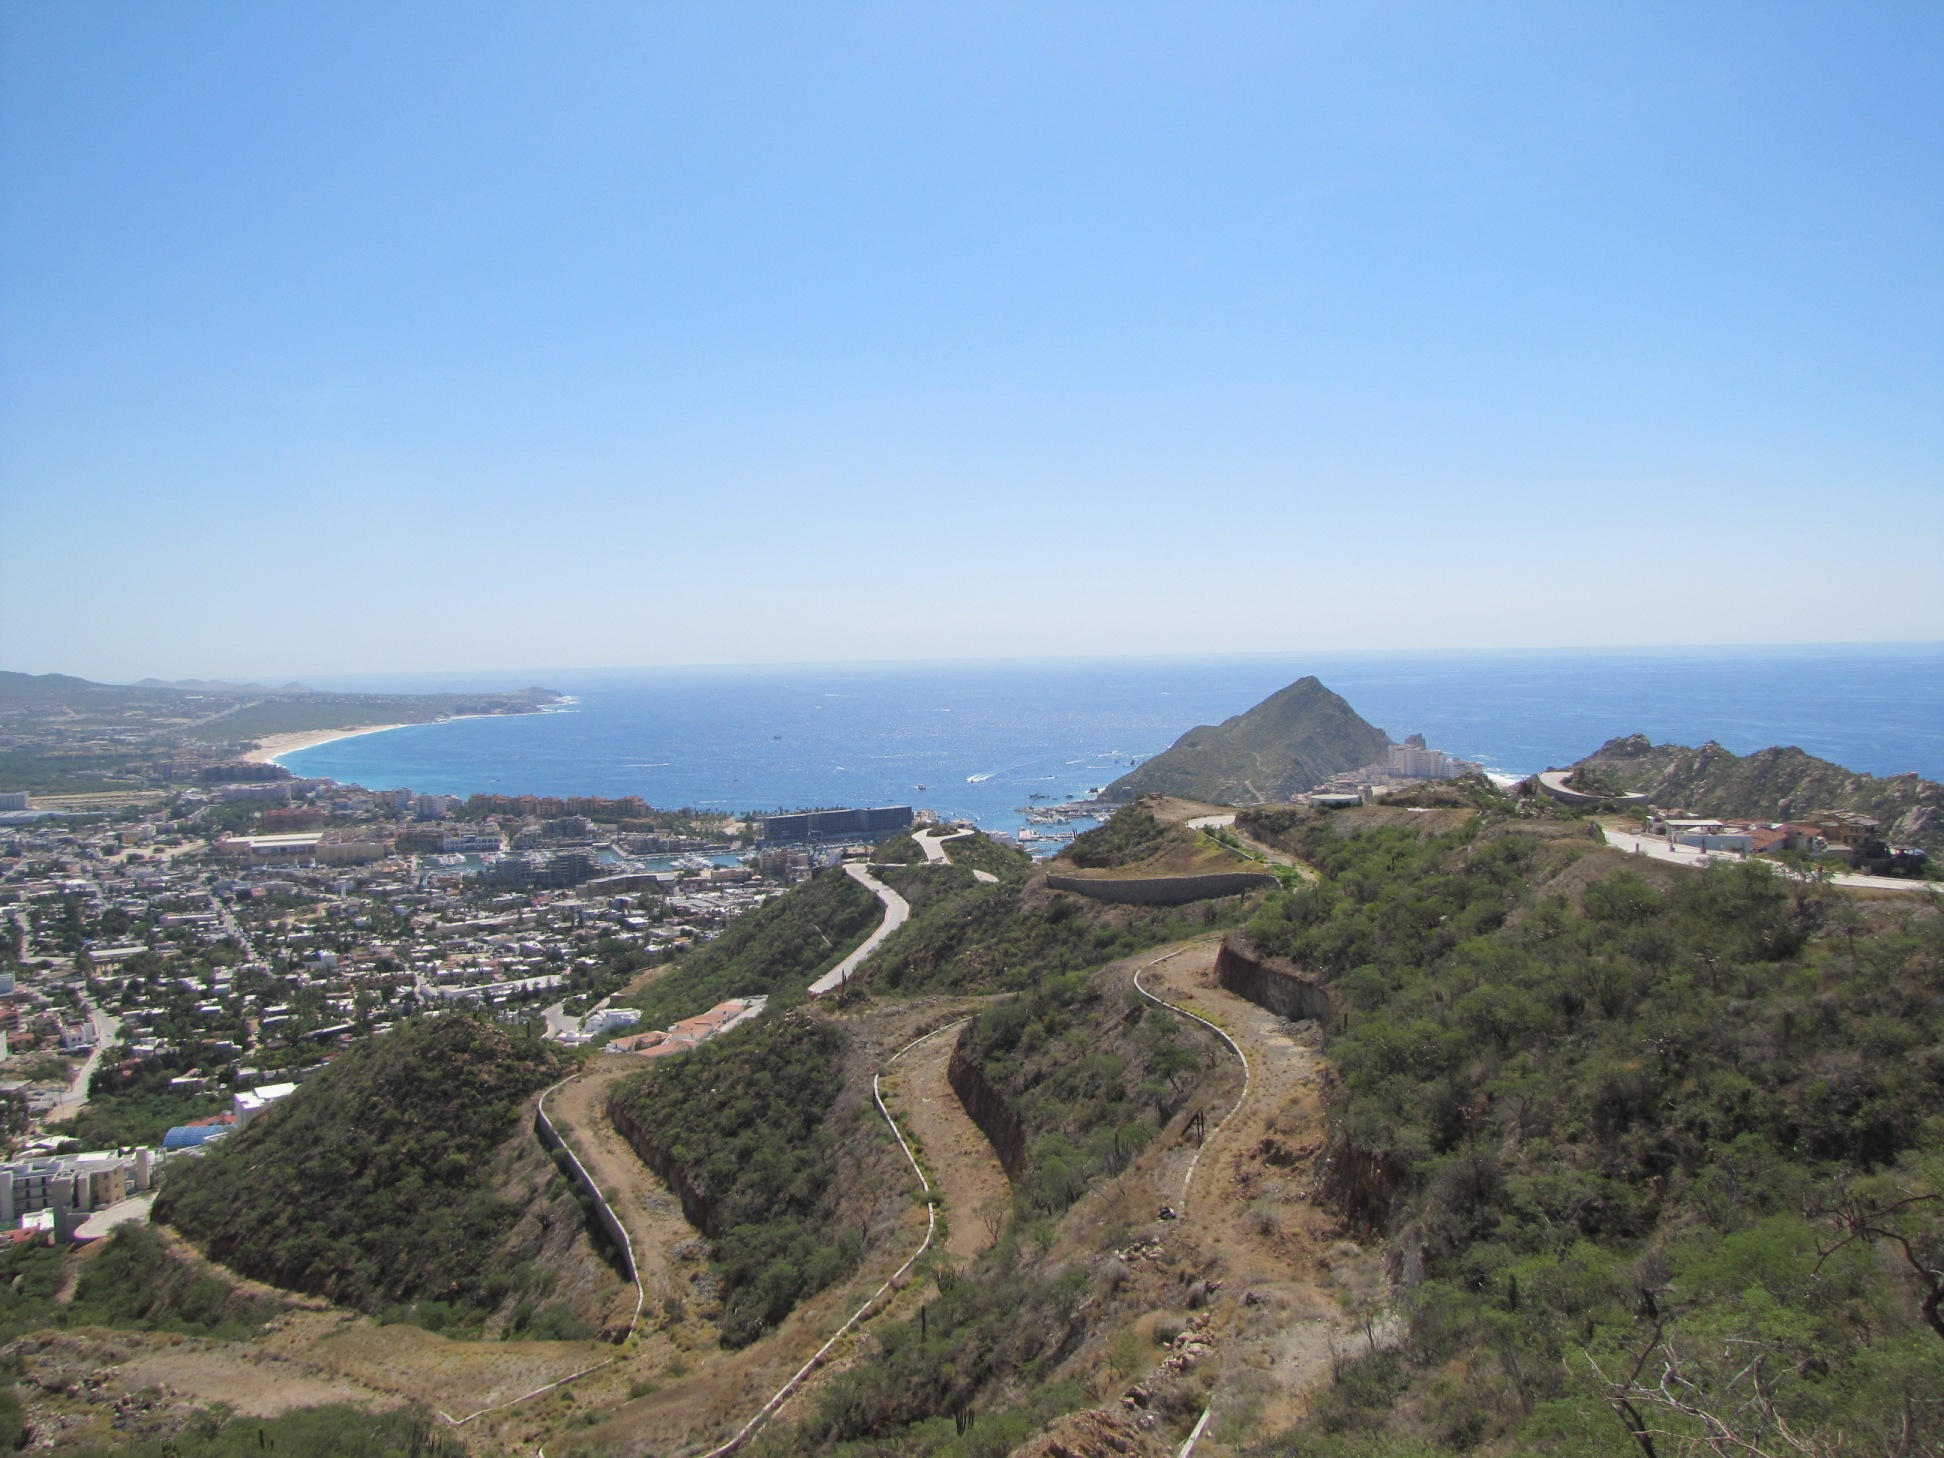 Camino del Cielo, Cabo San Lucas